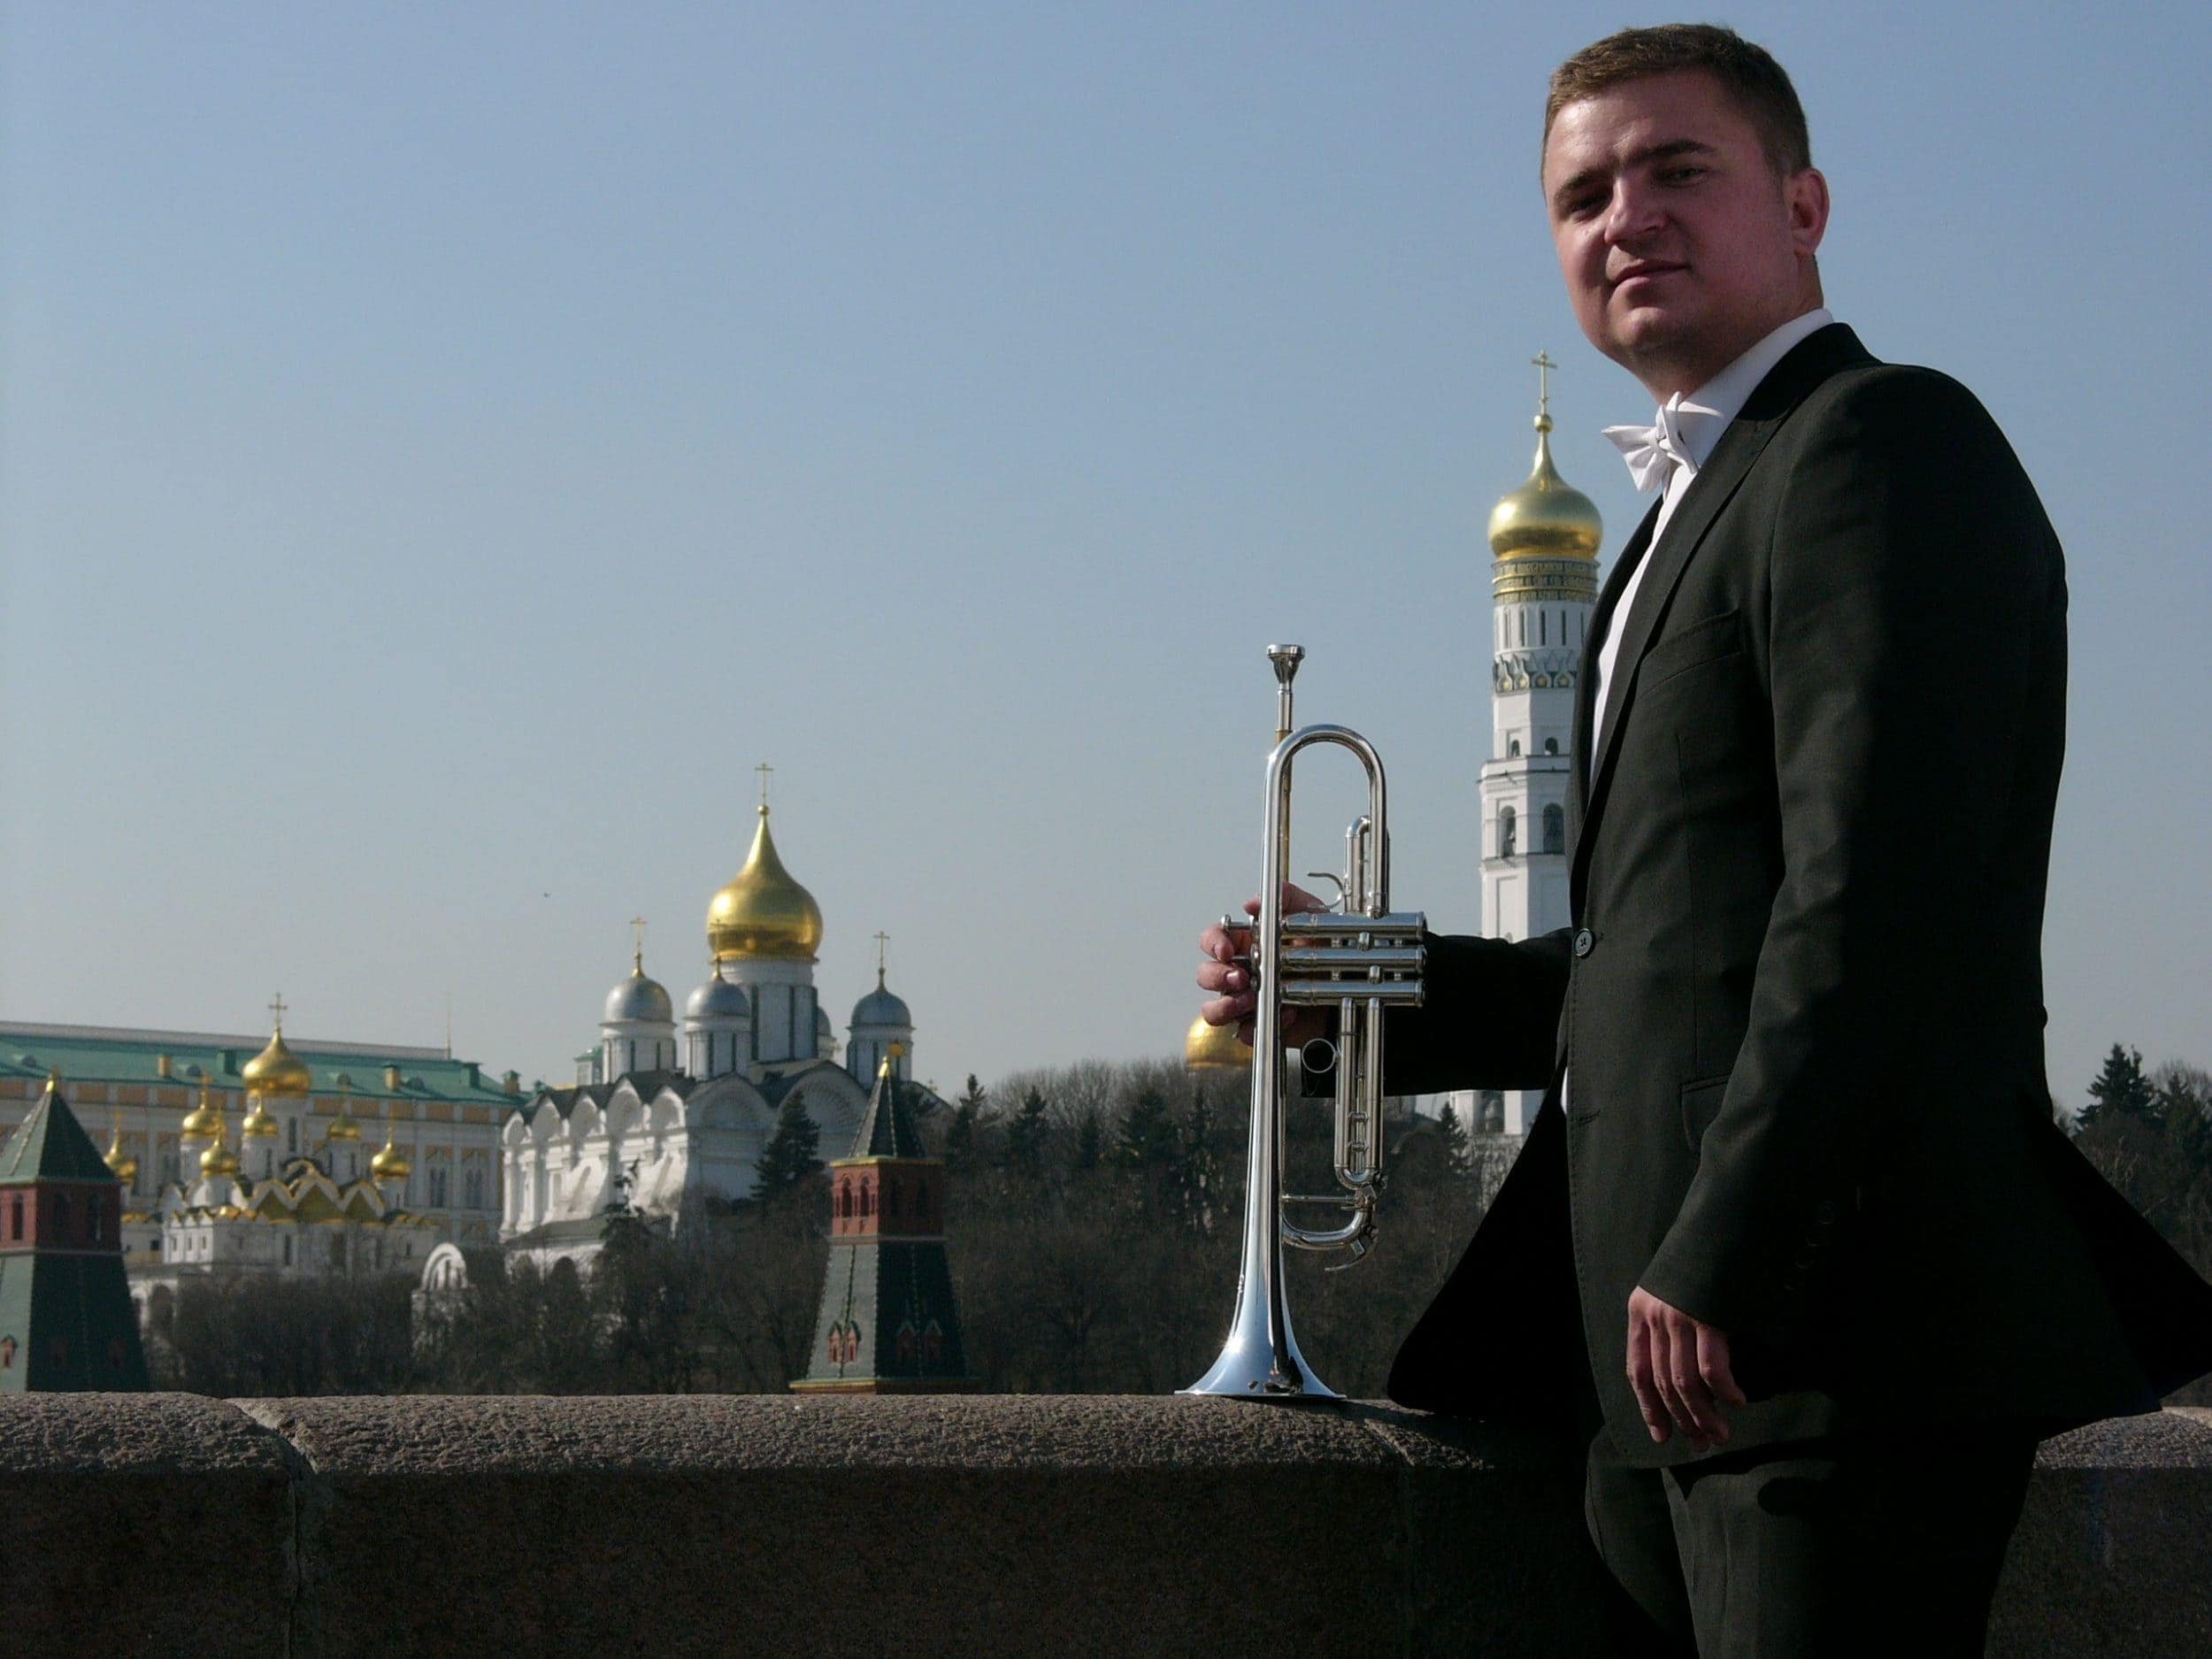 http://www.classicalmusicnews.ru/wp-content/uploads/2016/03/vladislav-lavrik.jpg